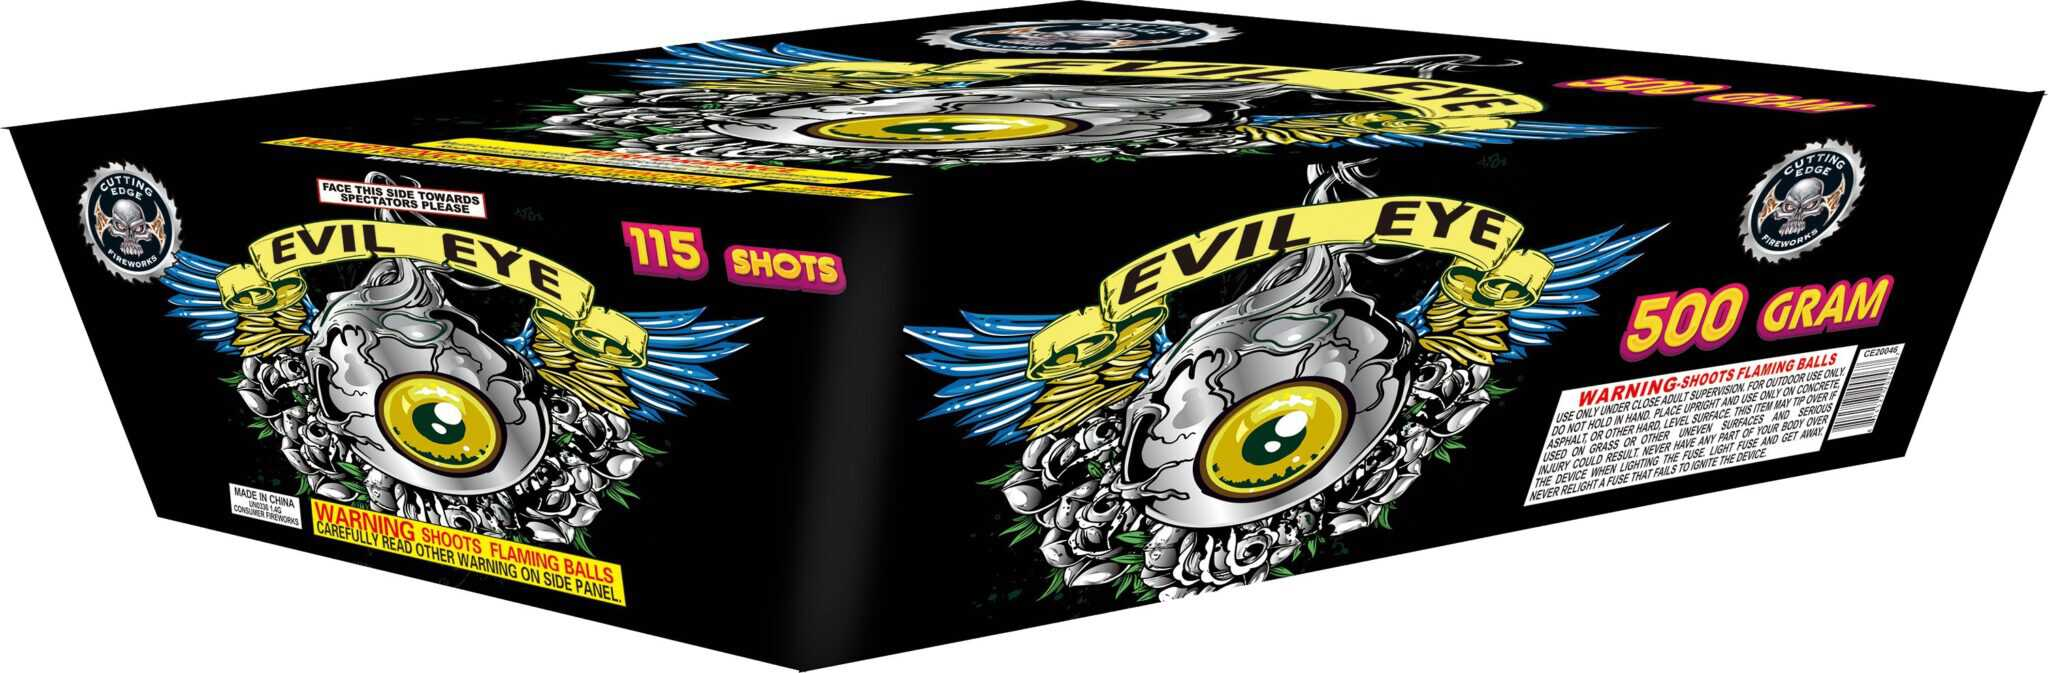 Evil Eye - 115 Shots